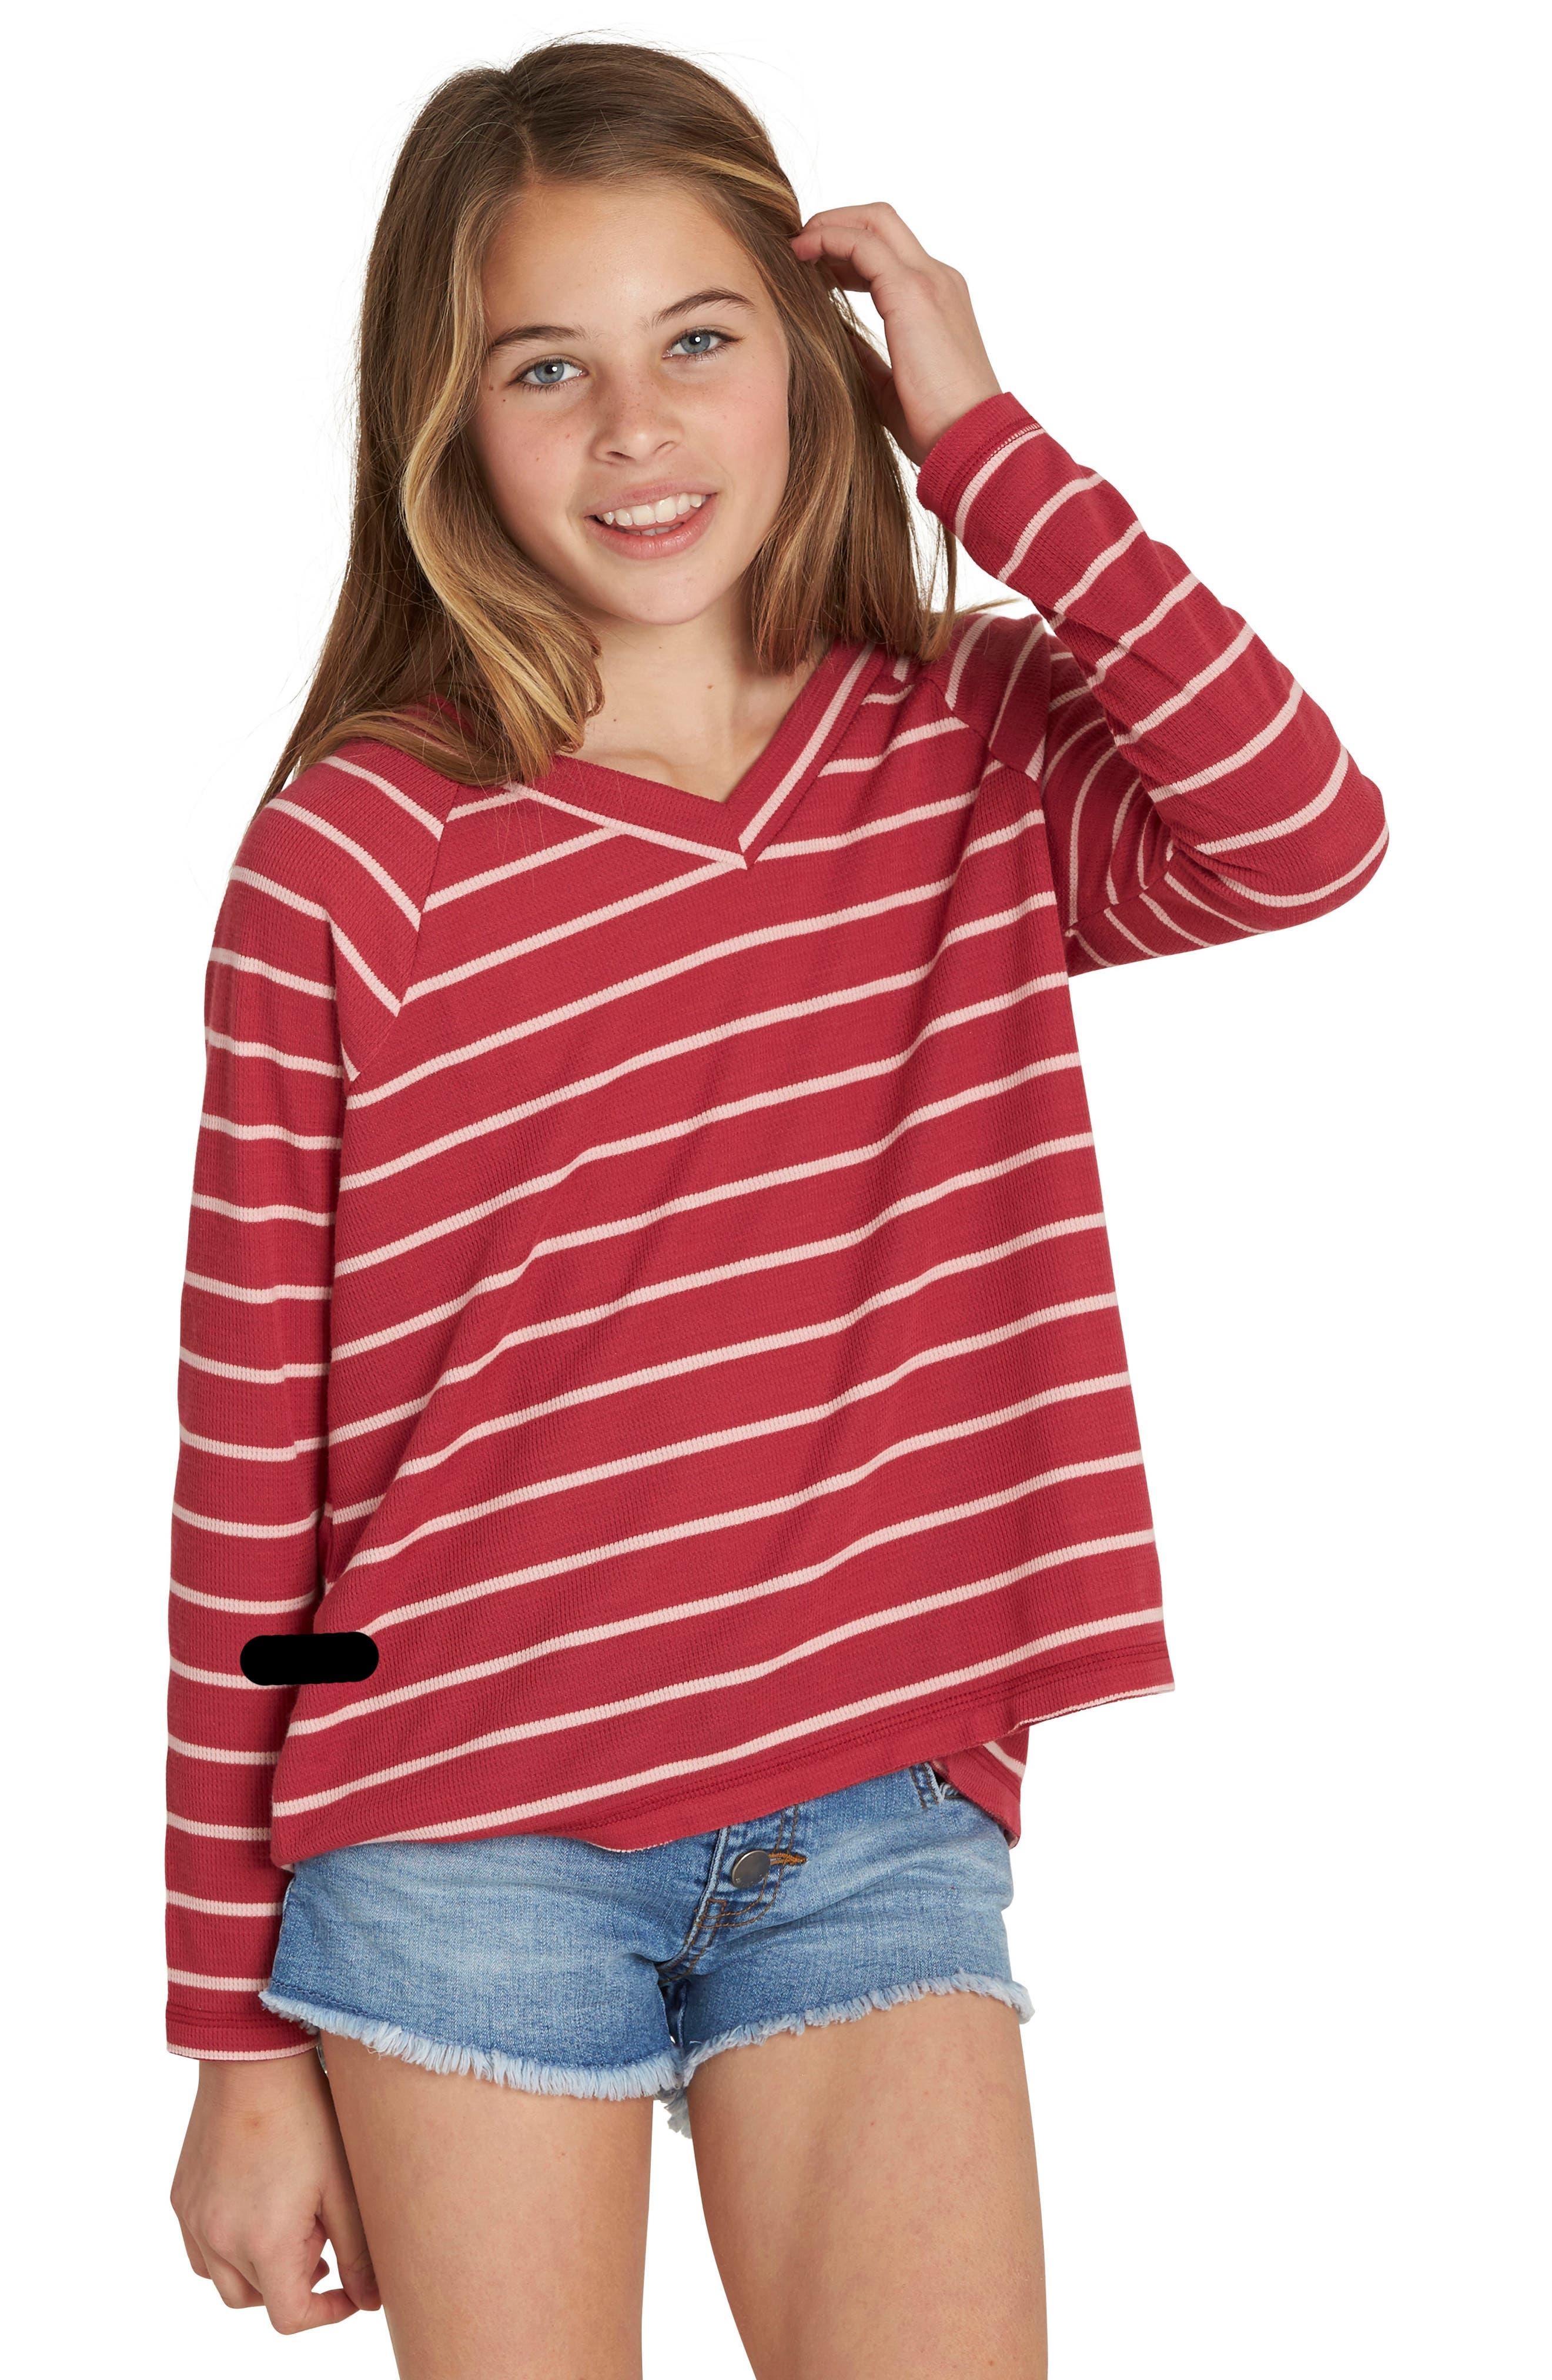 Alternate Image 1 Selected - Billabong Ocean Tides Waffle Knit Tee (Little Girls & Big Girls)